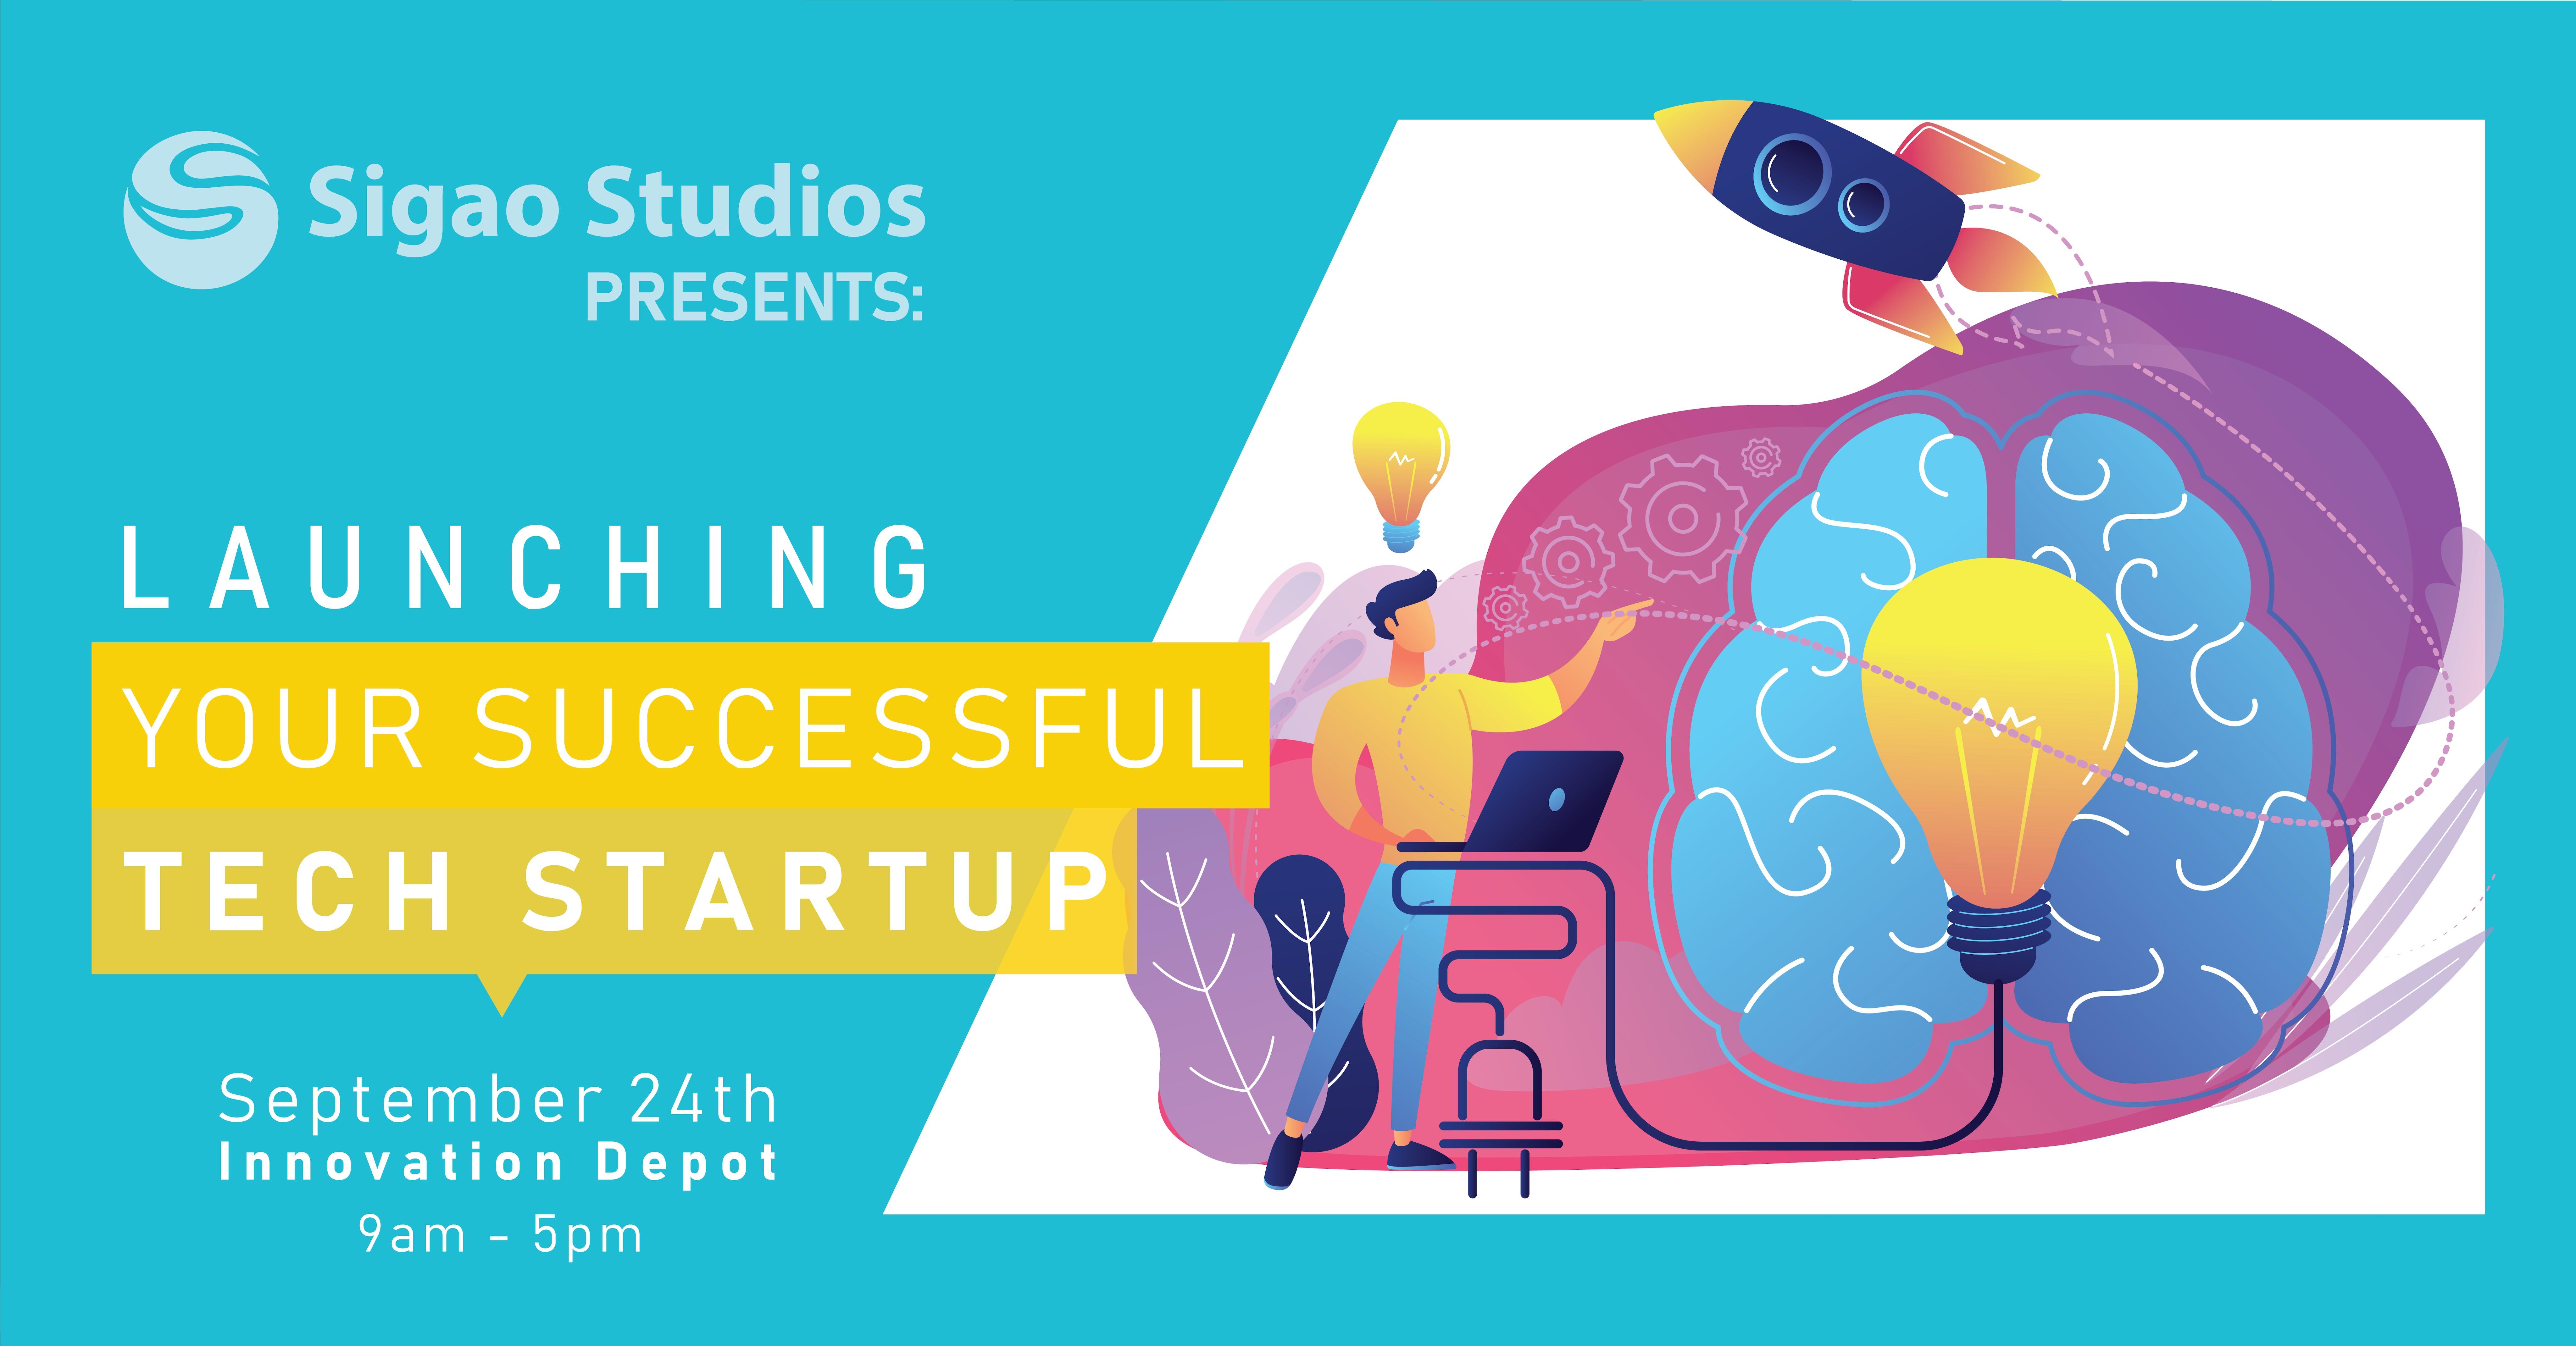 Launching Your Successful Tech Startup